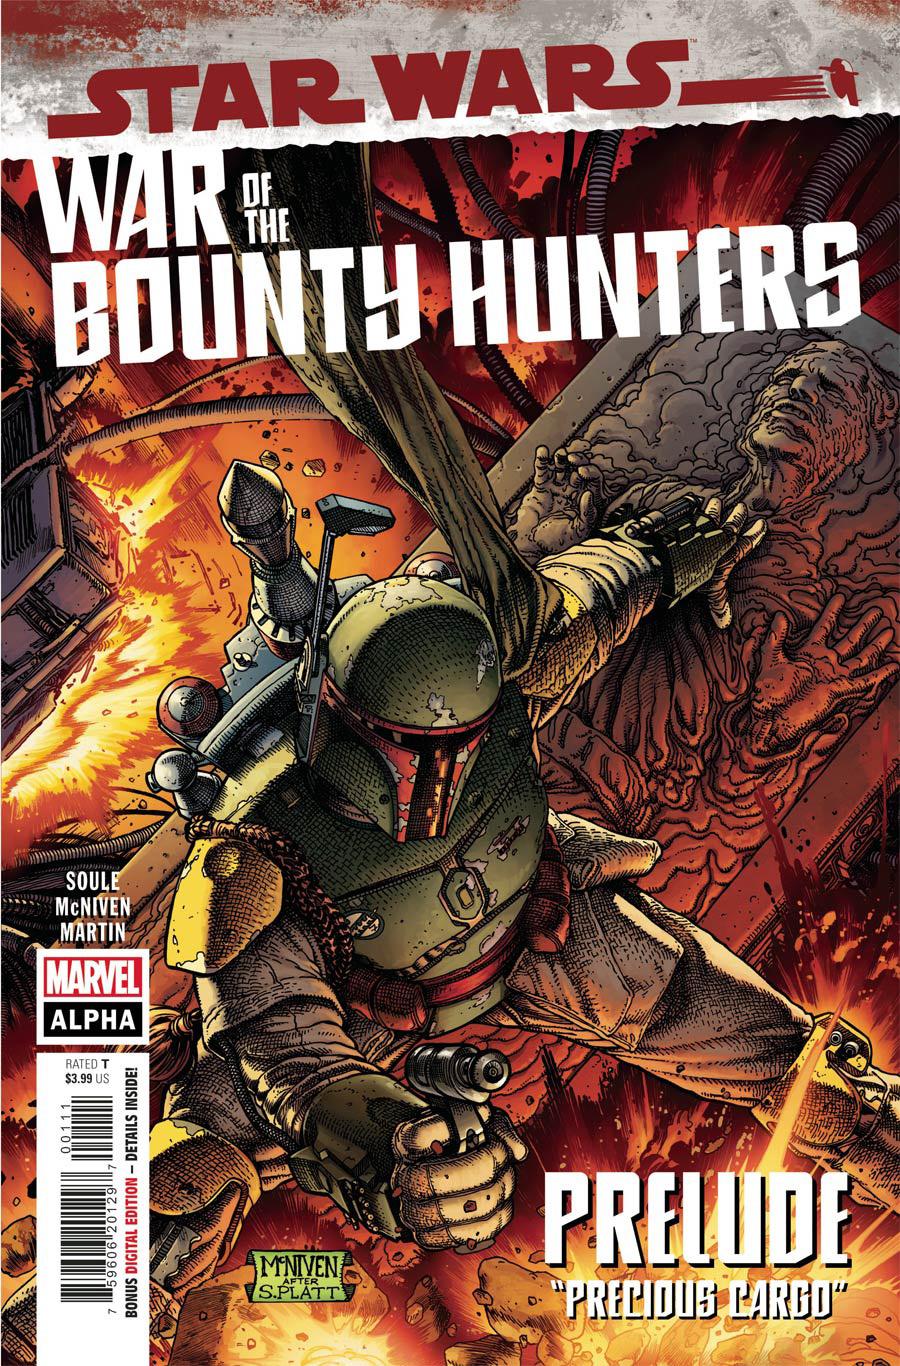 Star Wars War Of The Bounty Hunters Alpha #1 (One Shot) Cover A Regular Steve McNiven Cover (Limit 1 Per Customer)